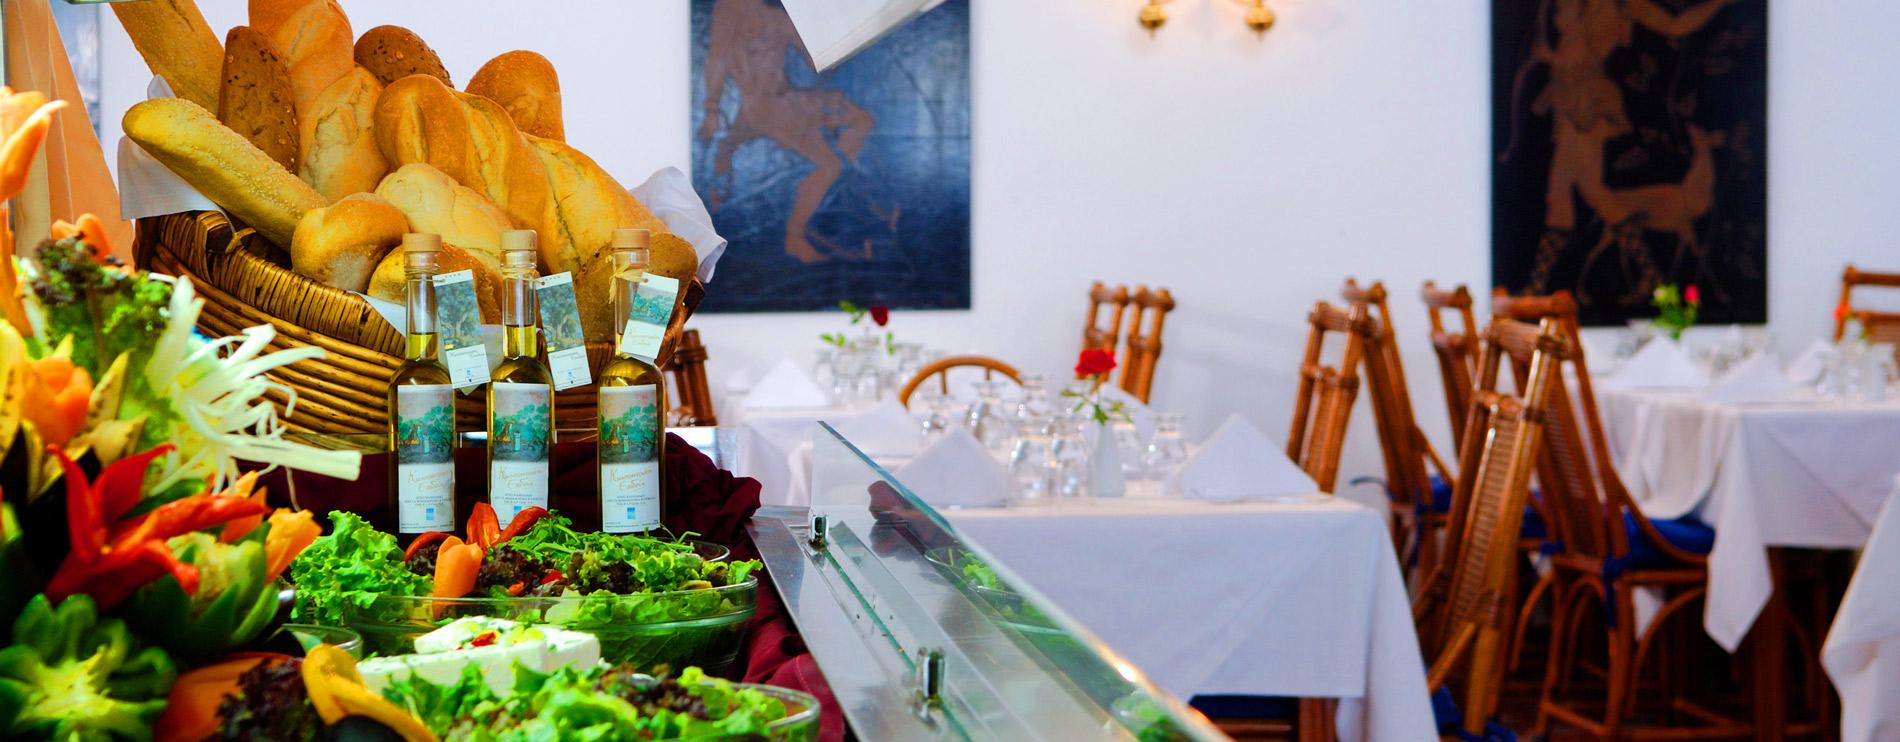 Alexander-Restaurant